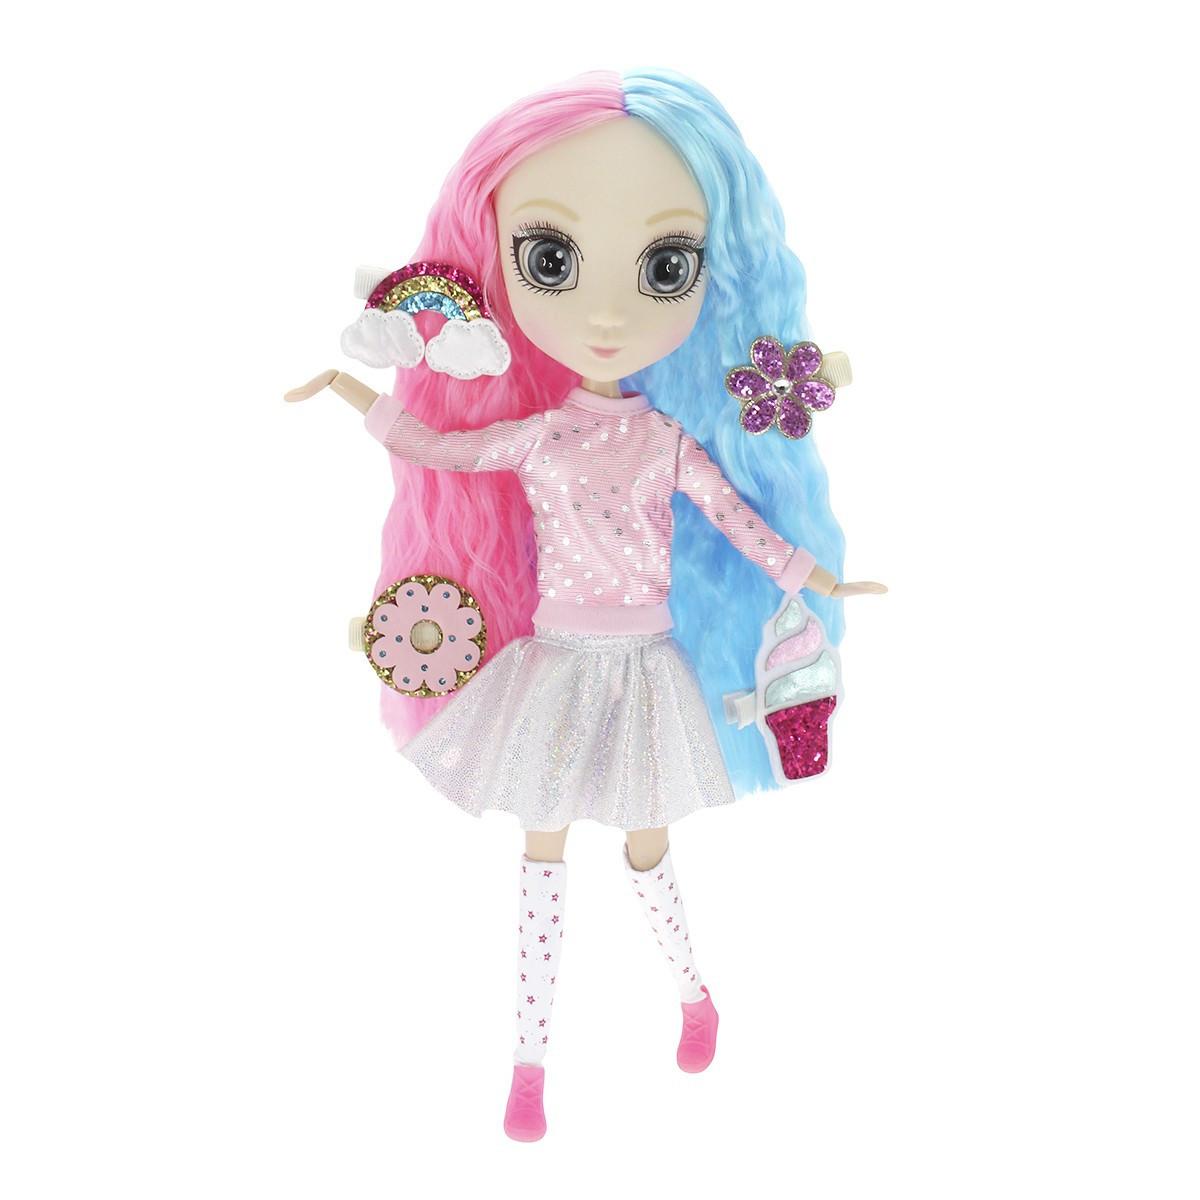 Кукла SHIBAJUKU S3 - ЮКИ (33 см, 6 точек артикуляции, с аксессуарами)